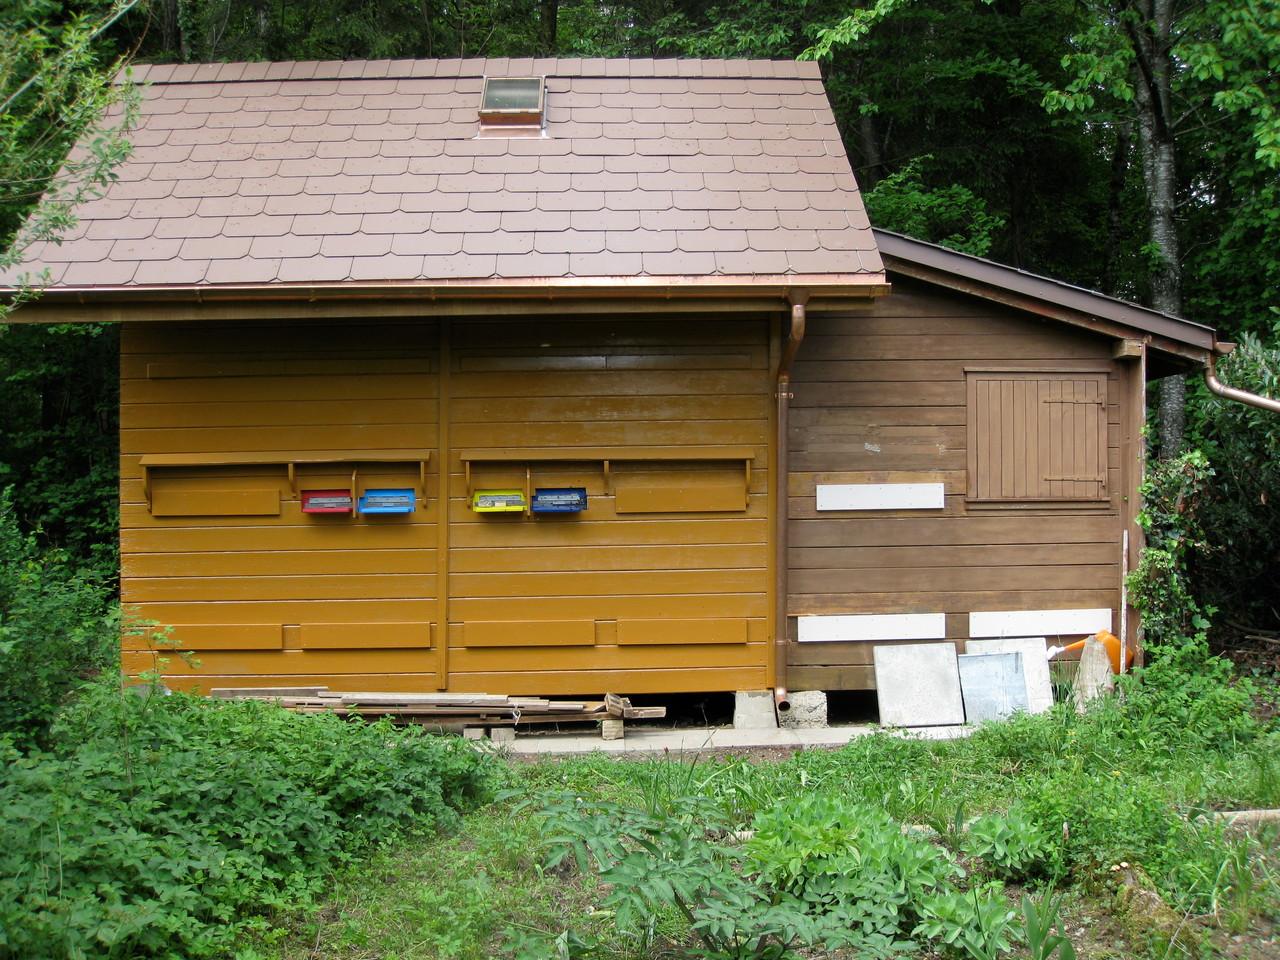 Bienenhaus: Nachher